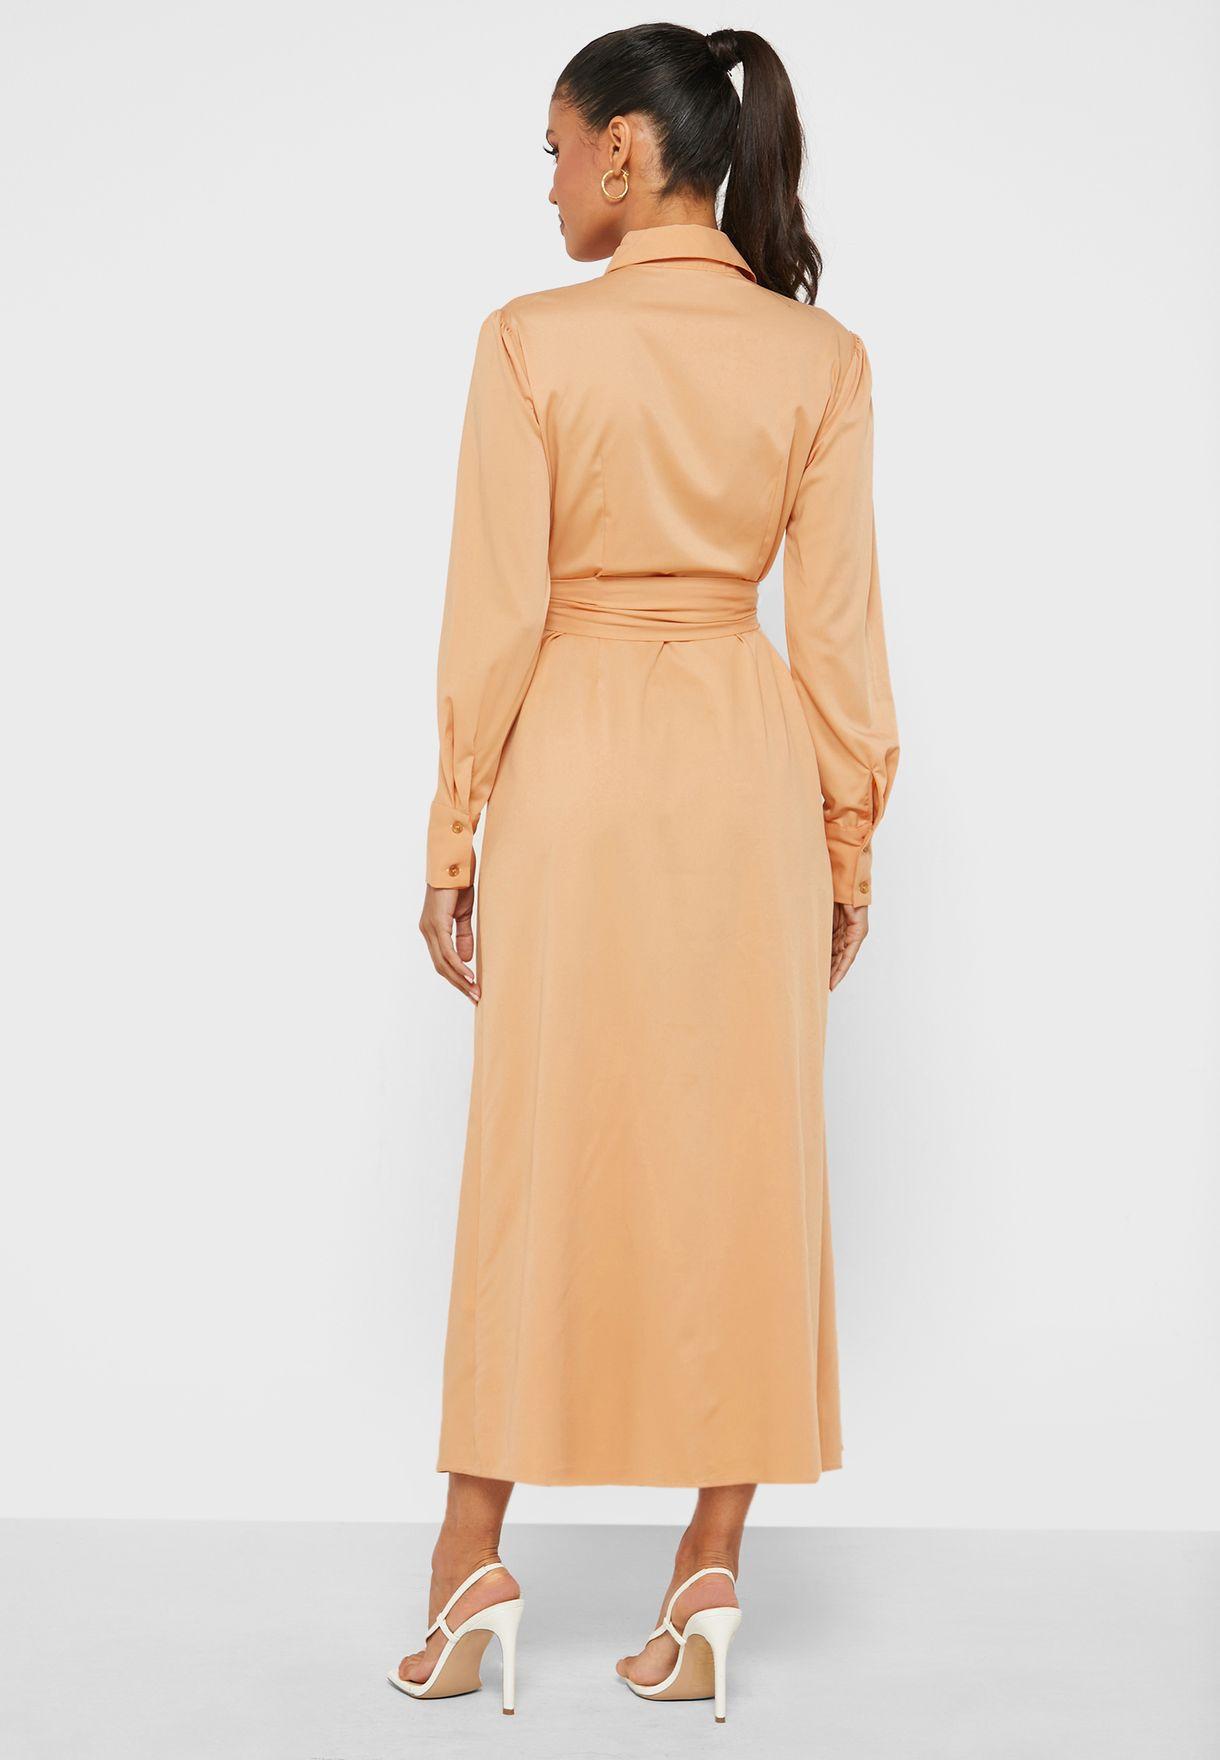 Ruffle Detailed Dress